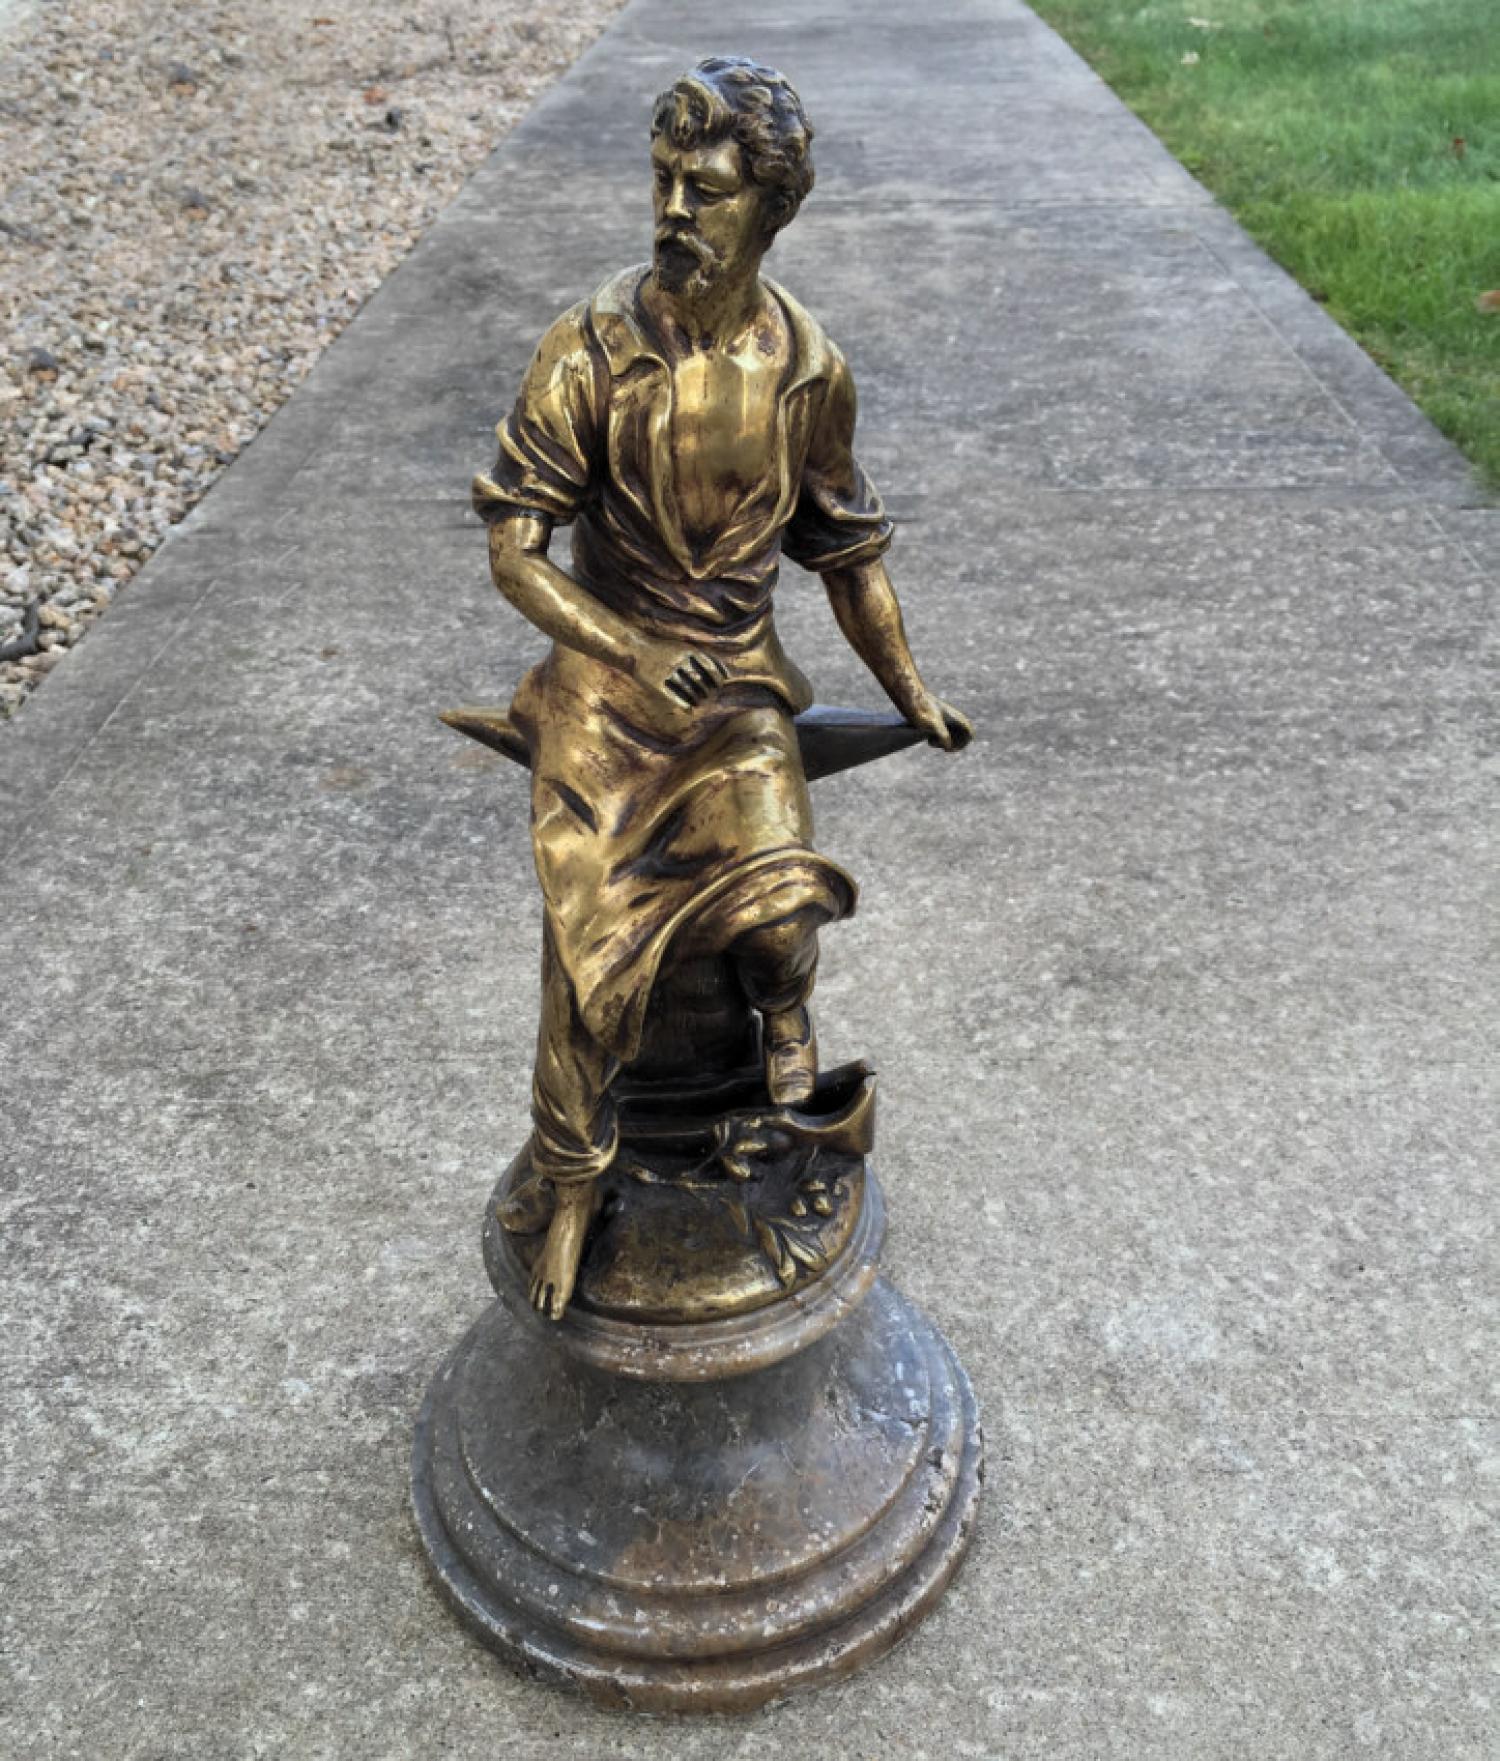 19th century bronze farrier sculpture